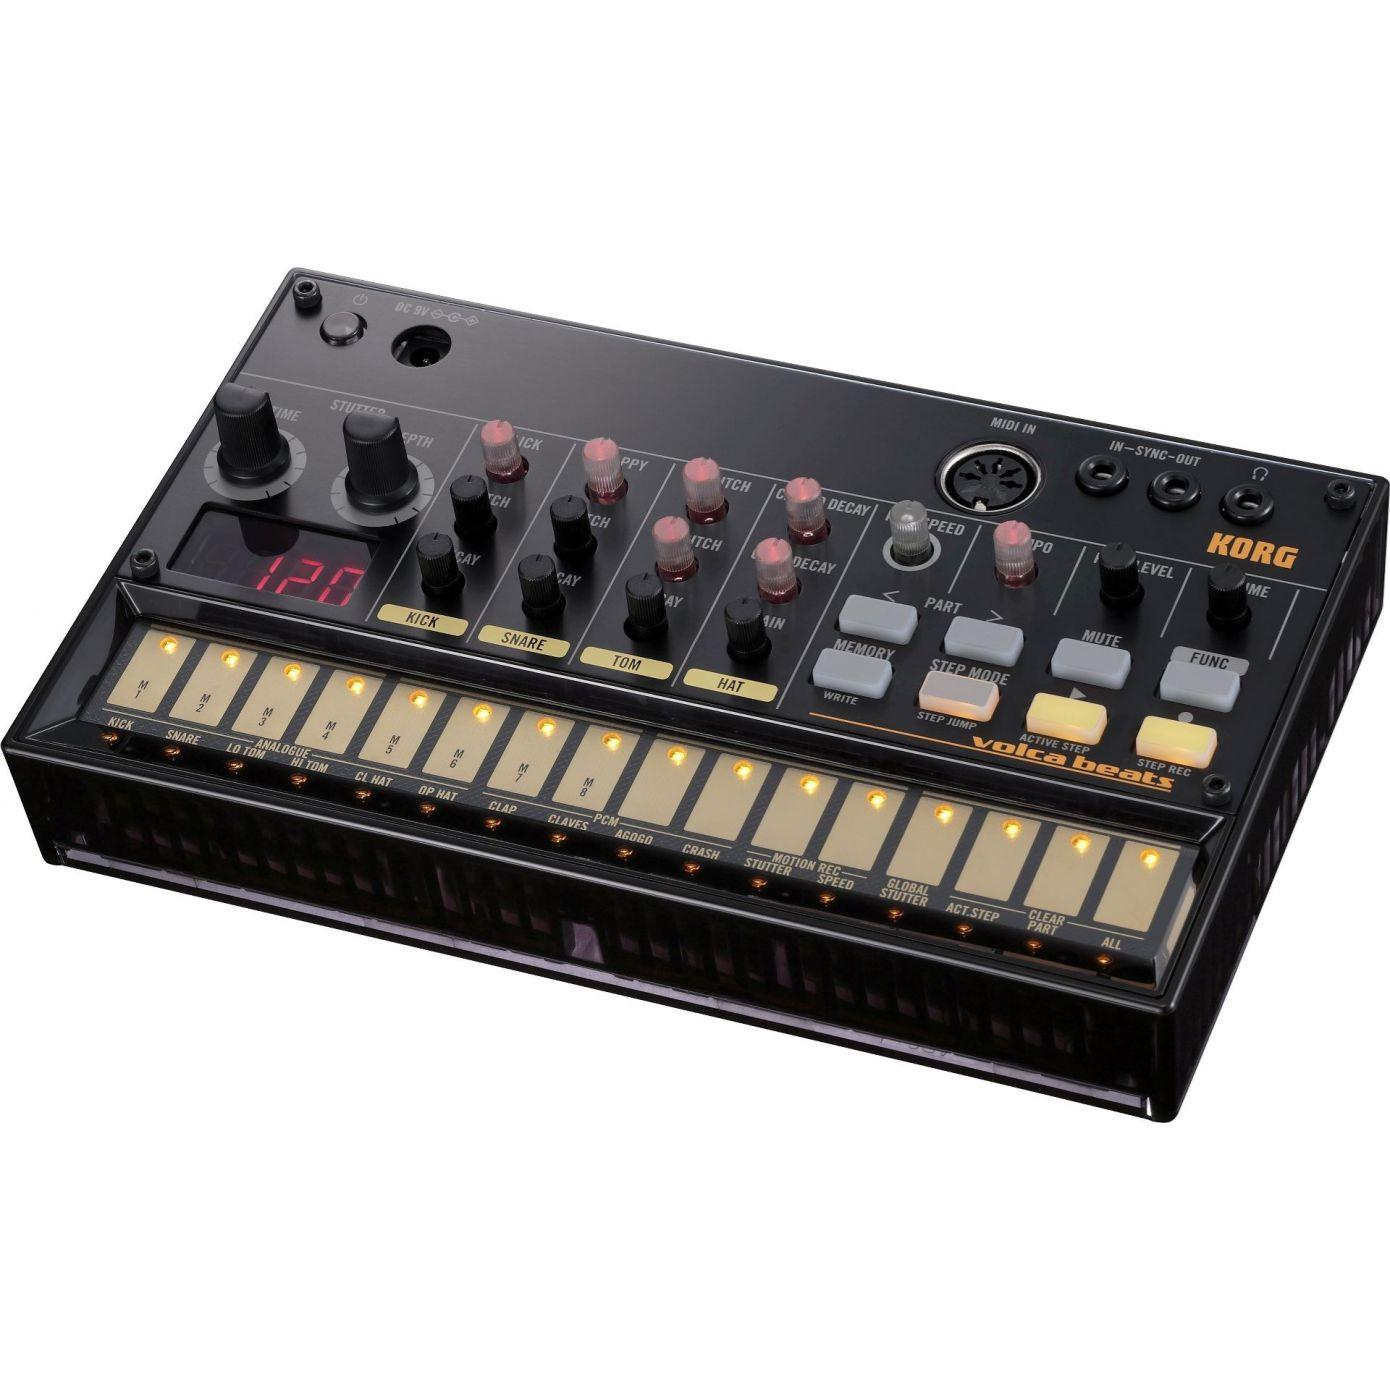 Korg Volca Beats - Analogue Rhythm Machine